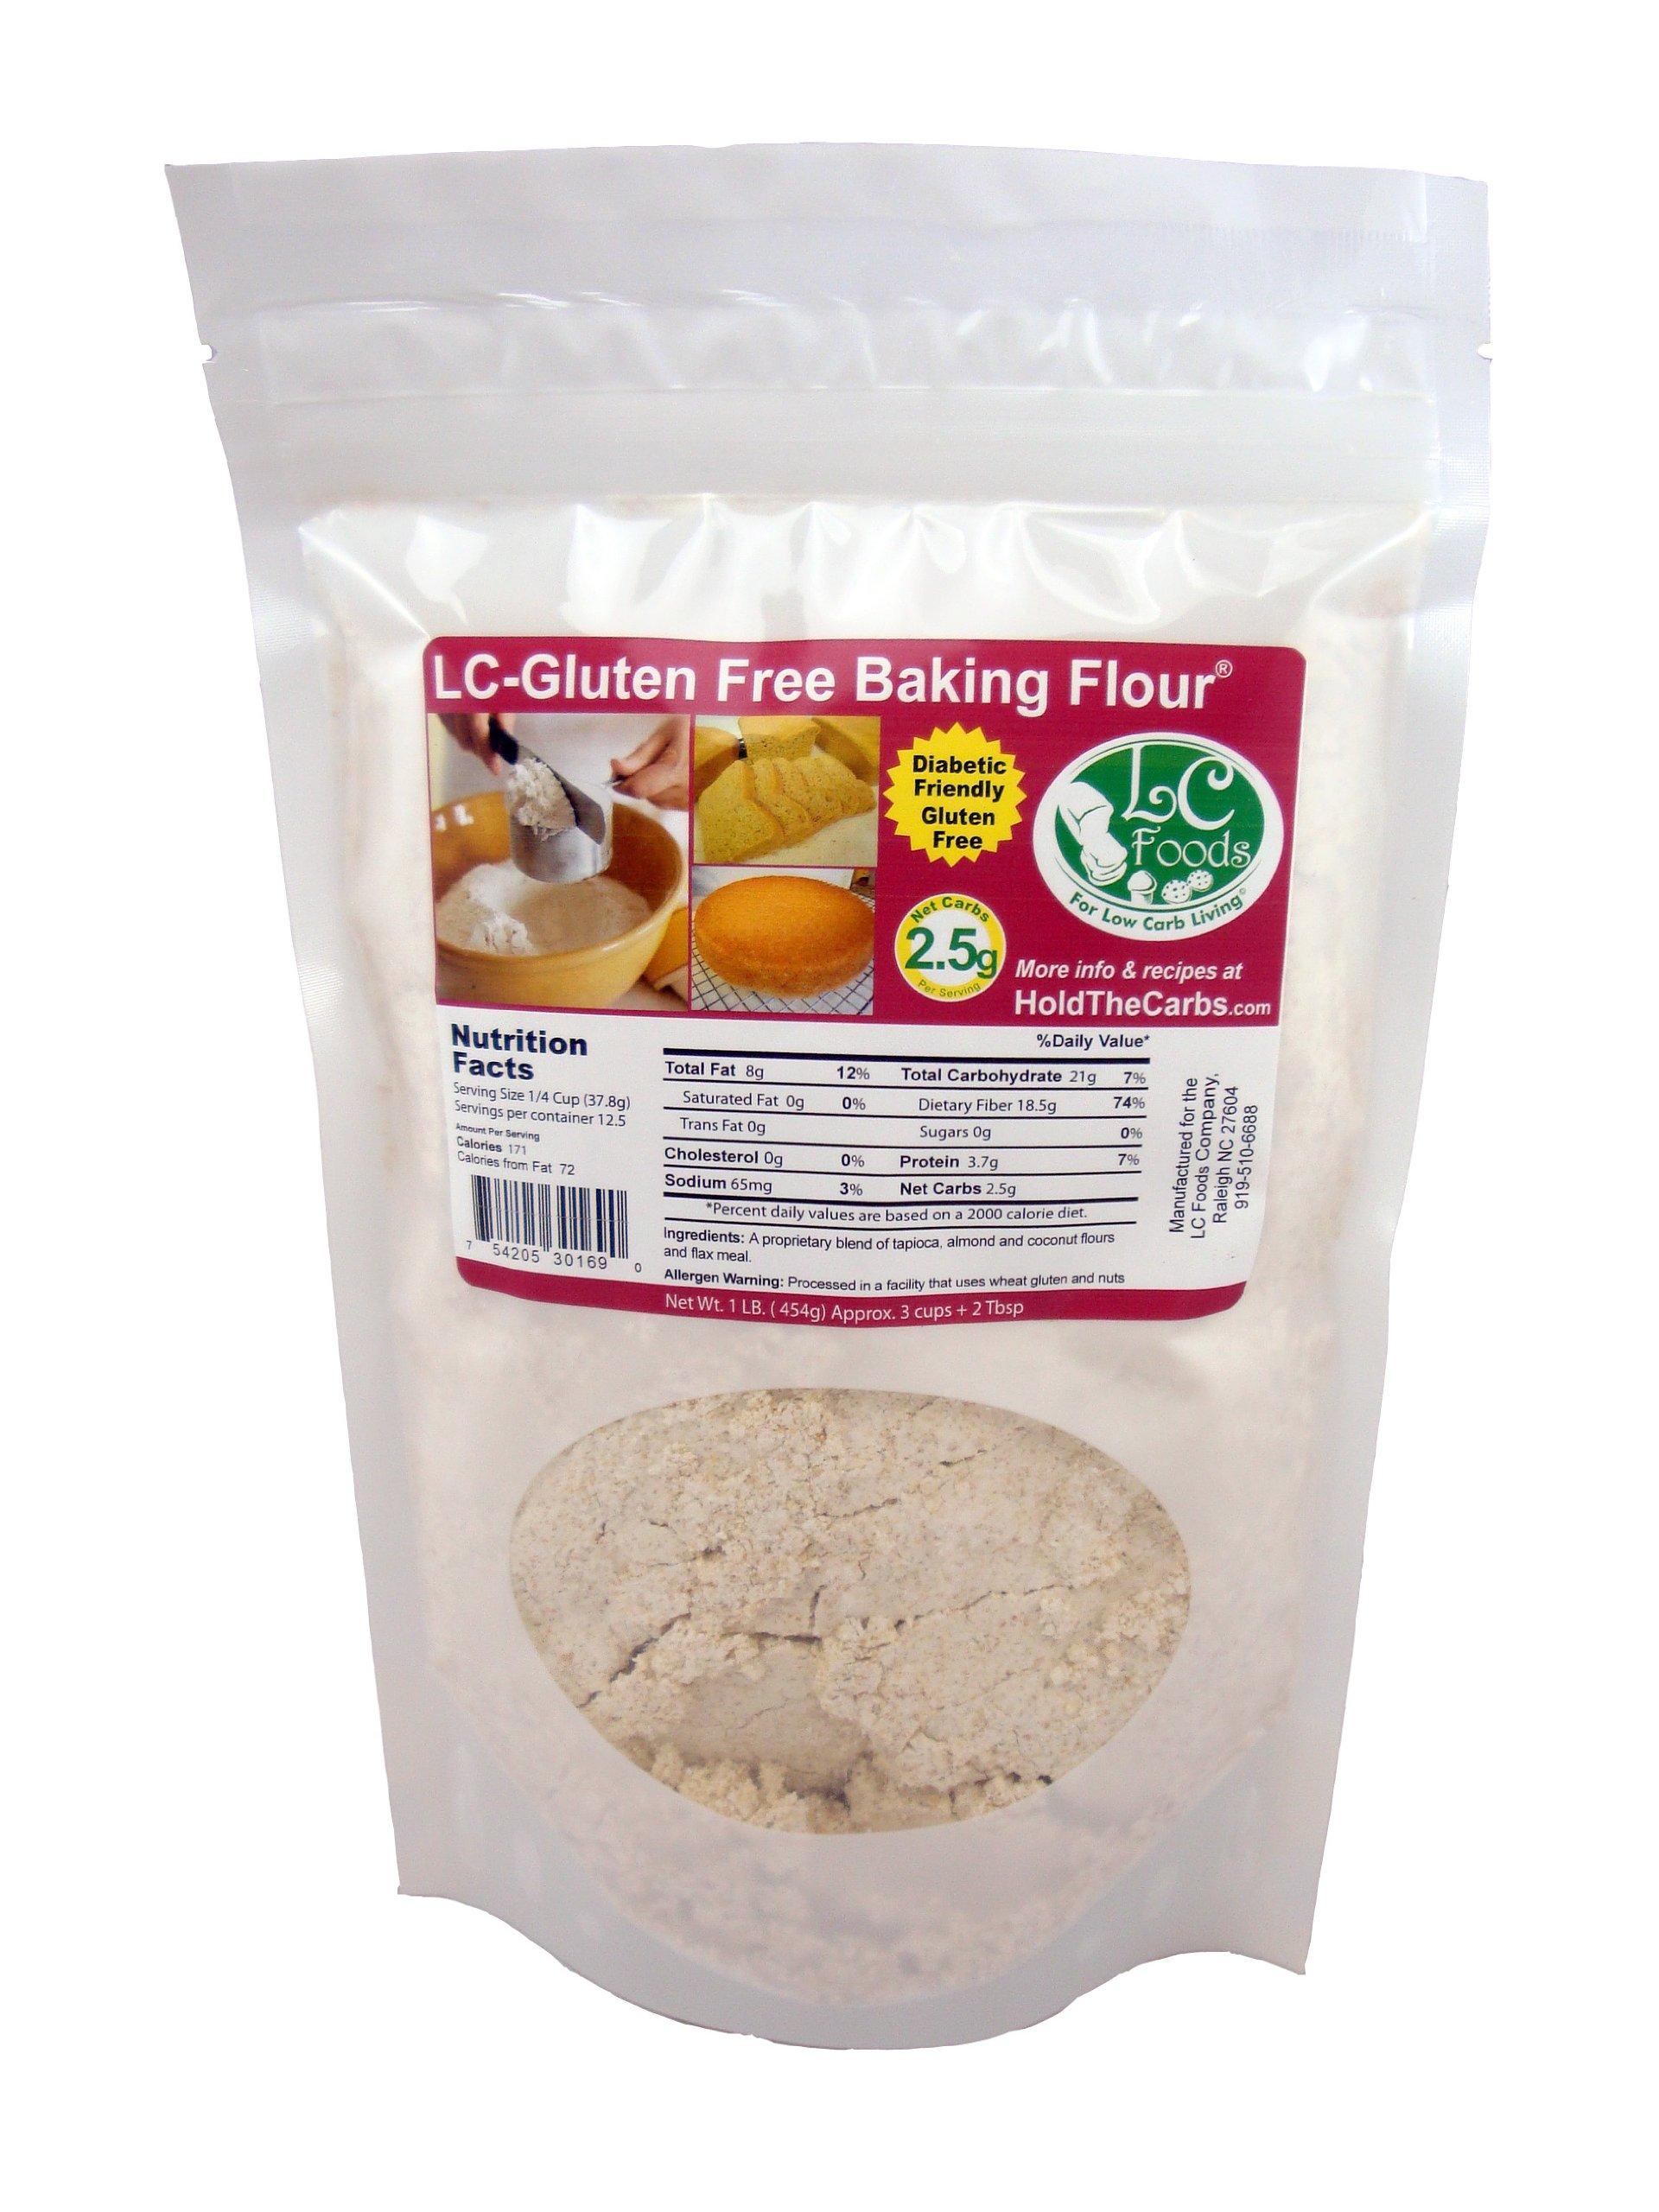 Low Carb Gluten Free Baking Flour (1 LB) - LC Foods - All Natural - Paleo - No Sugar - Diabetic Friendly